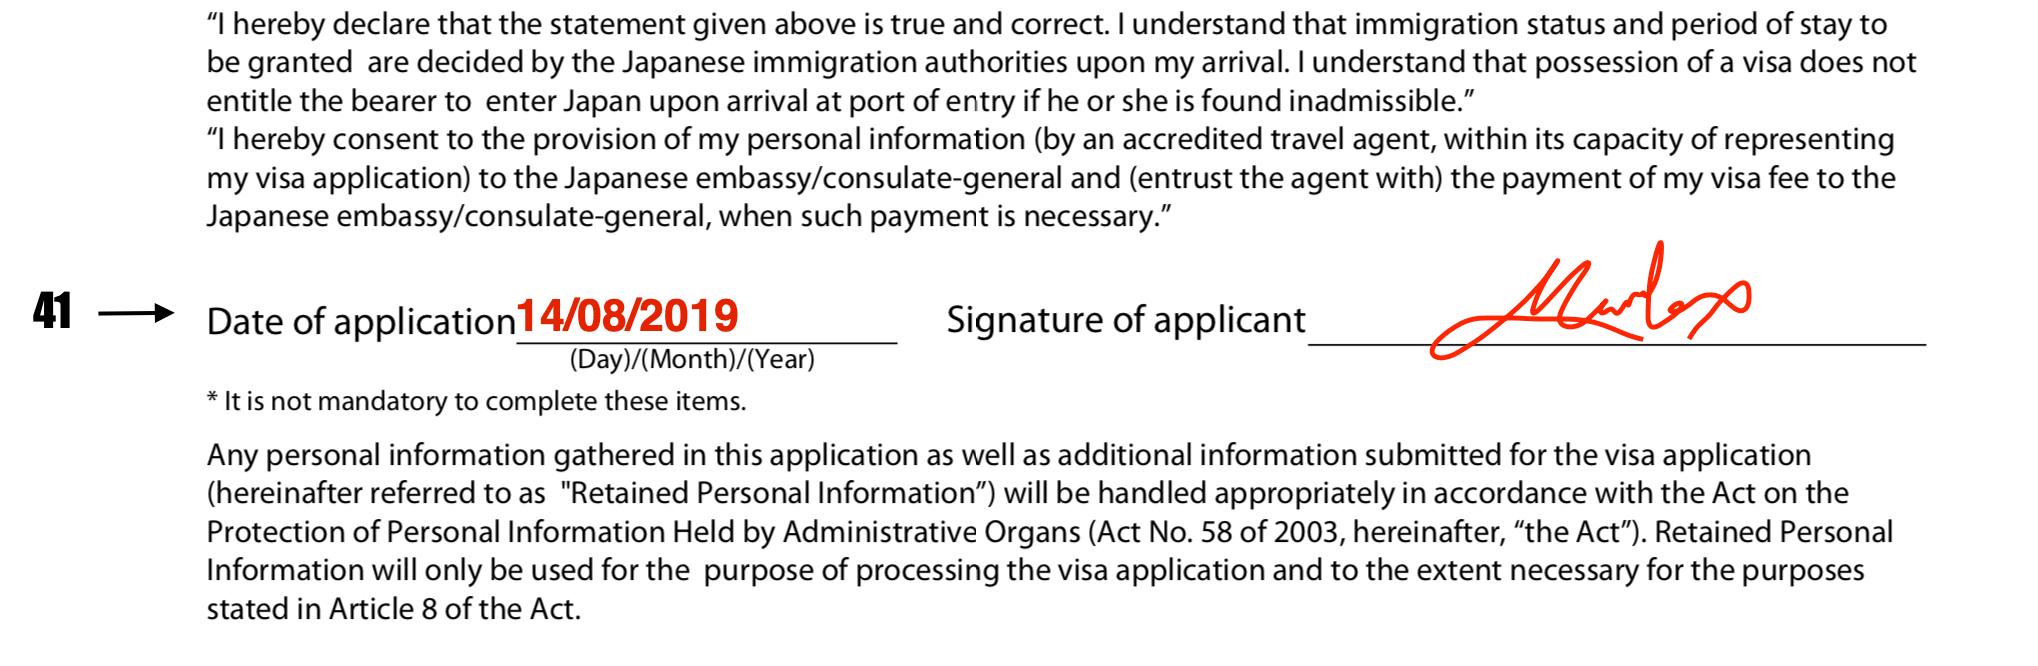 japan-visa-application-pdf.png